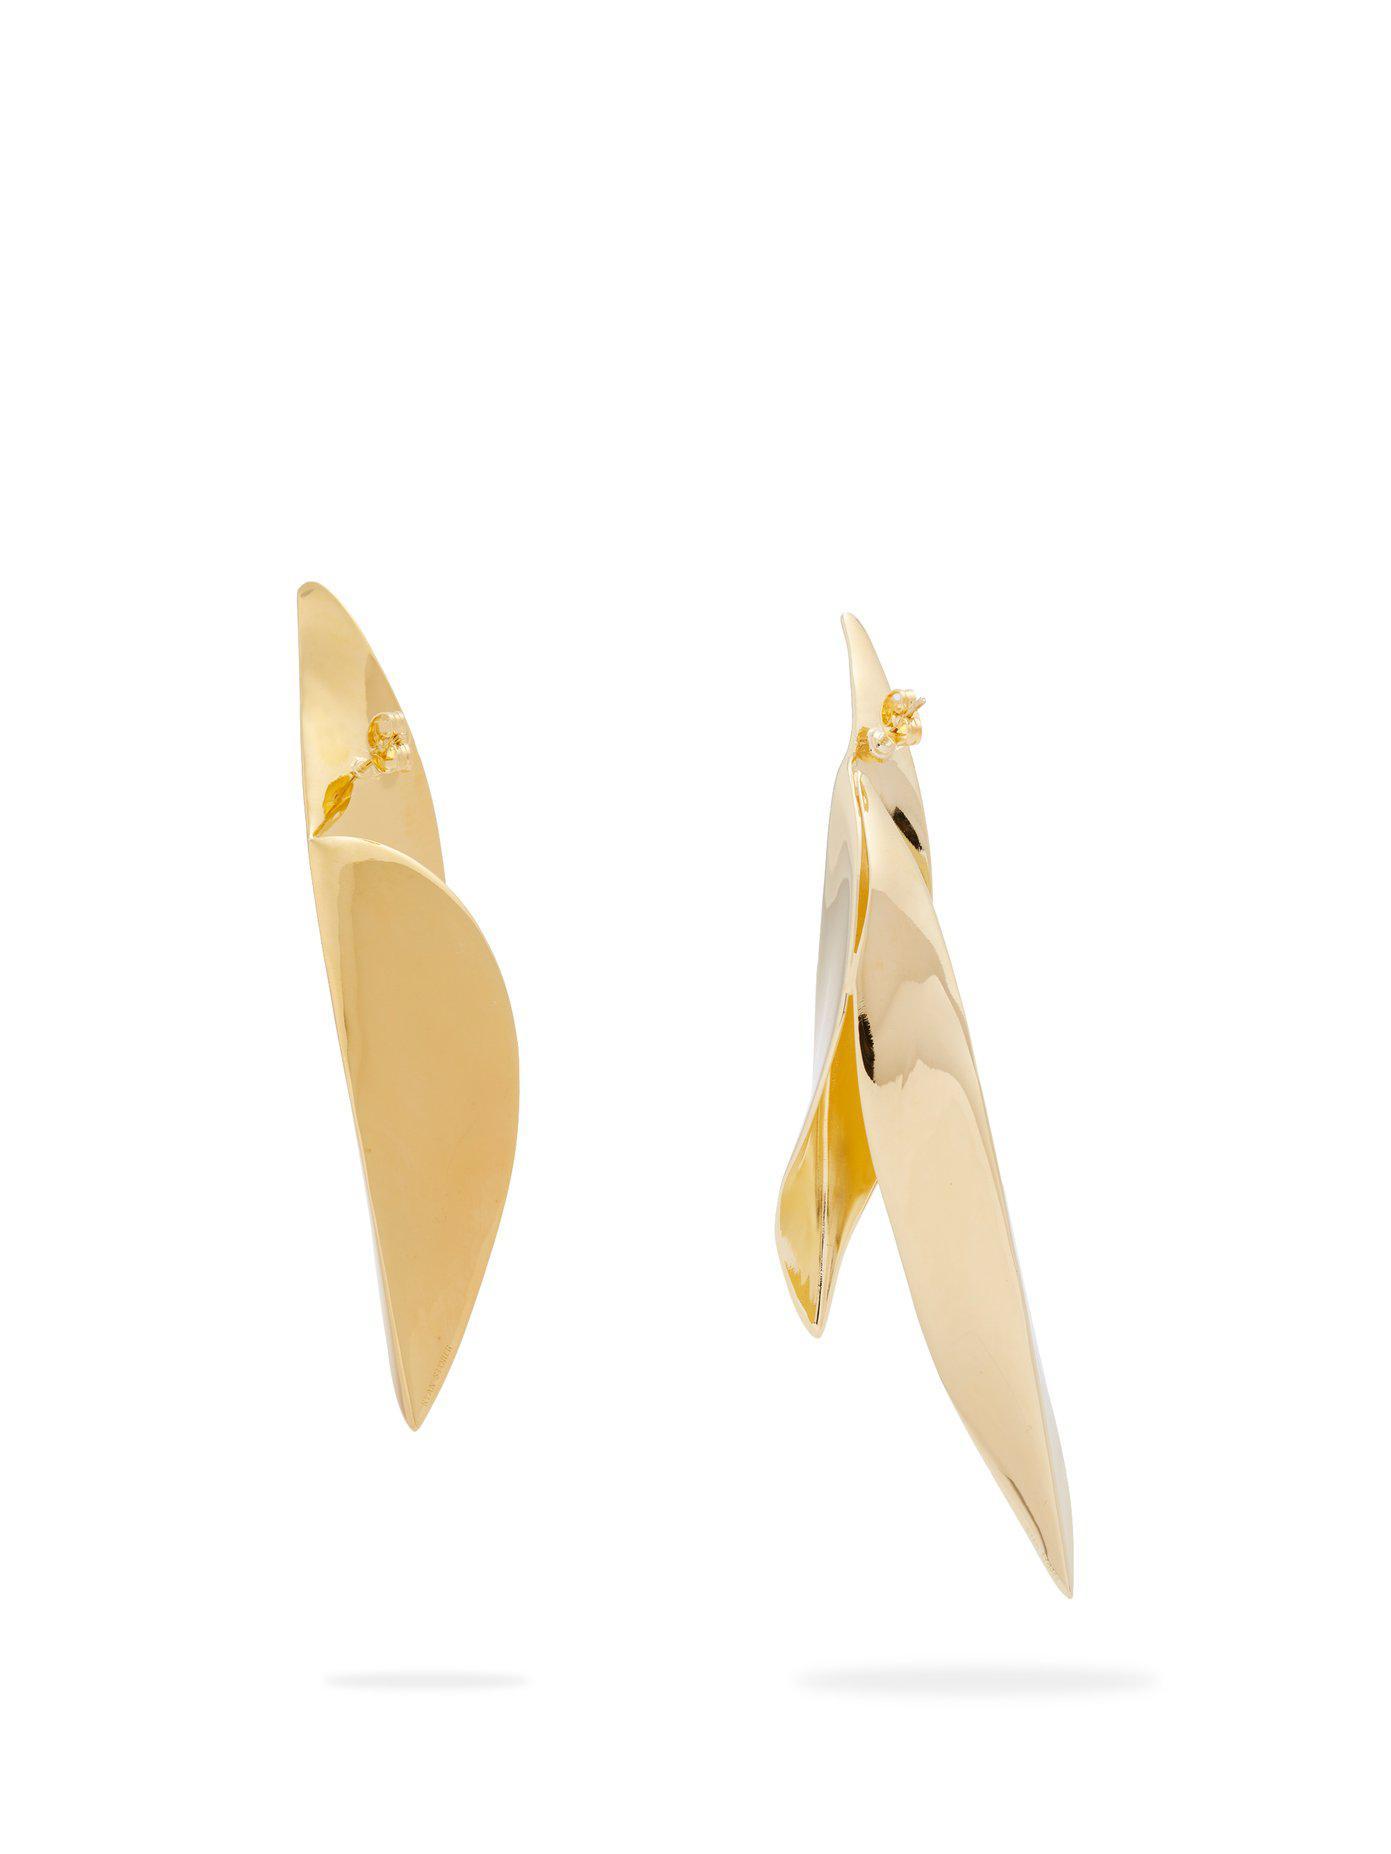 Ryan Storer Sansevieria gold-plated earrings 1rYKfU